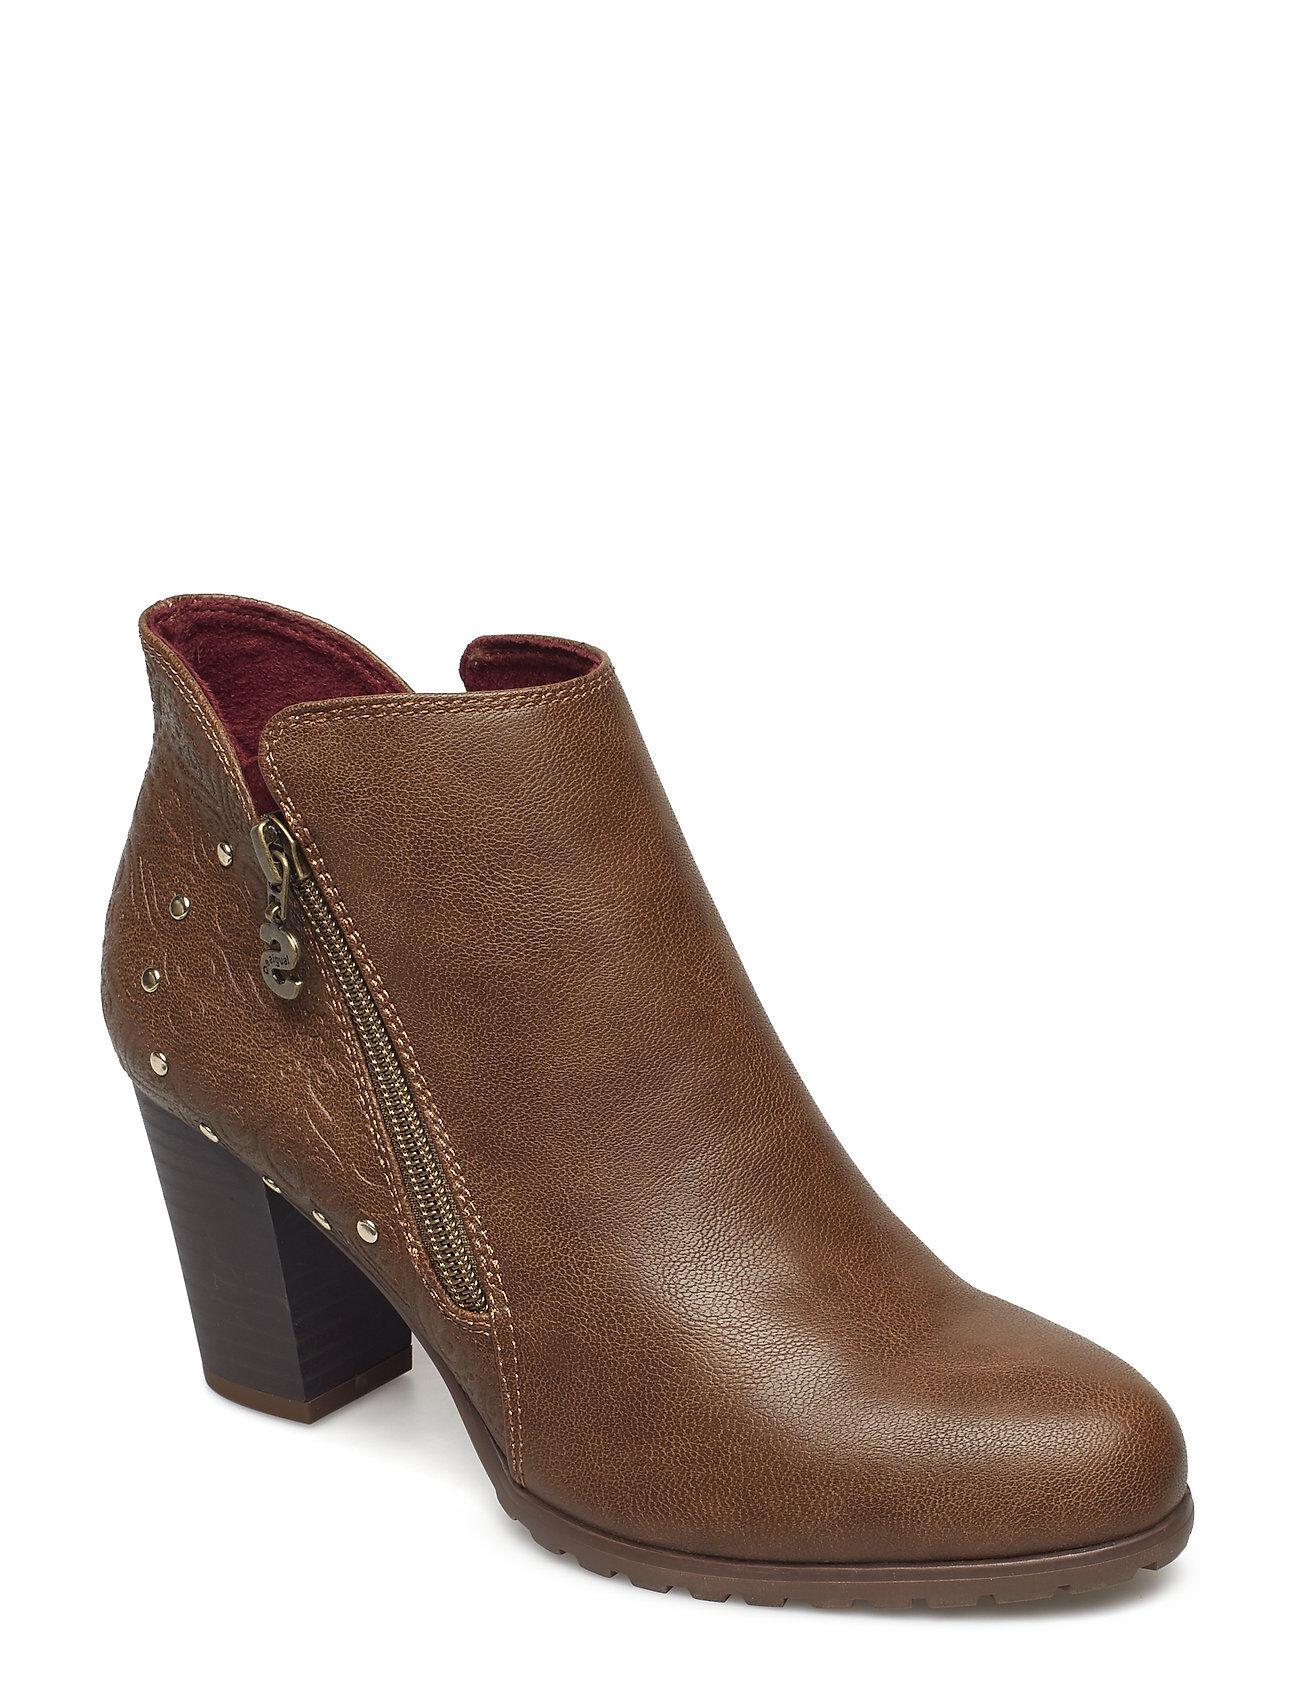 Desigual Shoes Shoes Frida Wi